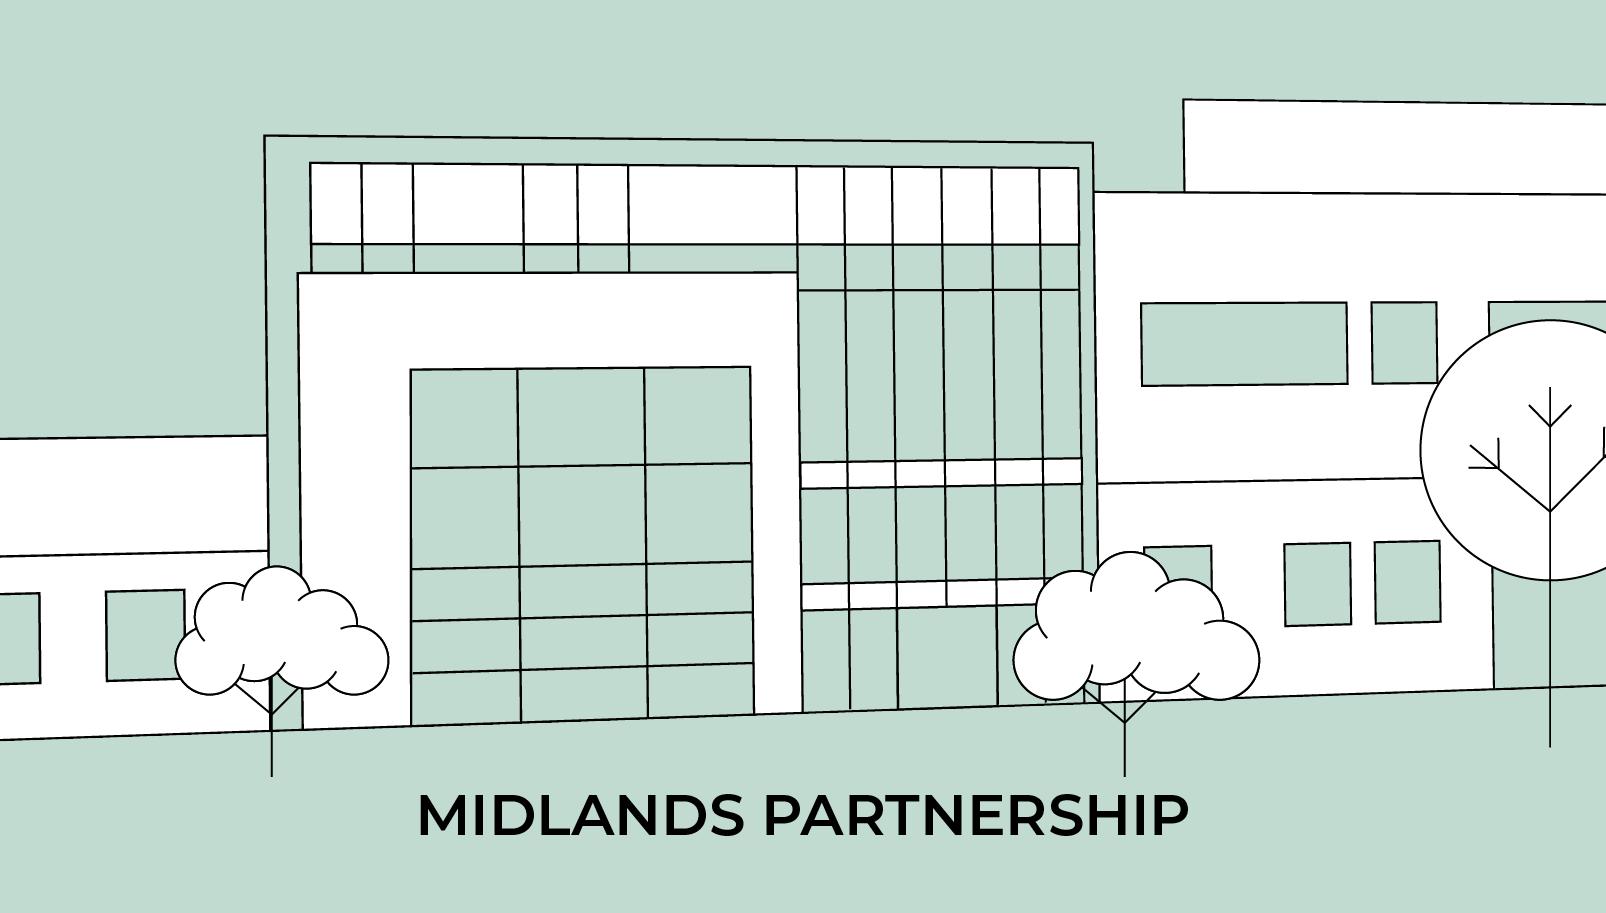 Midlands Partnership